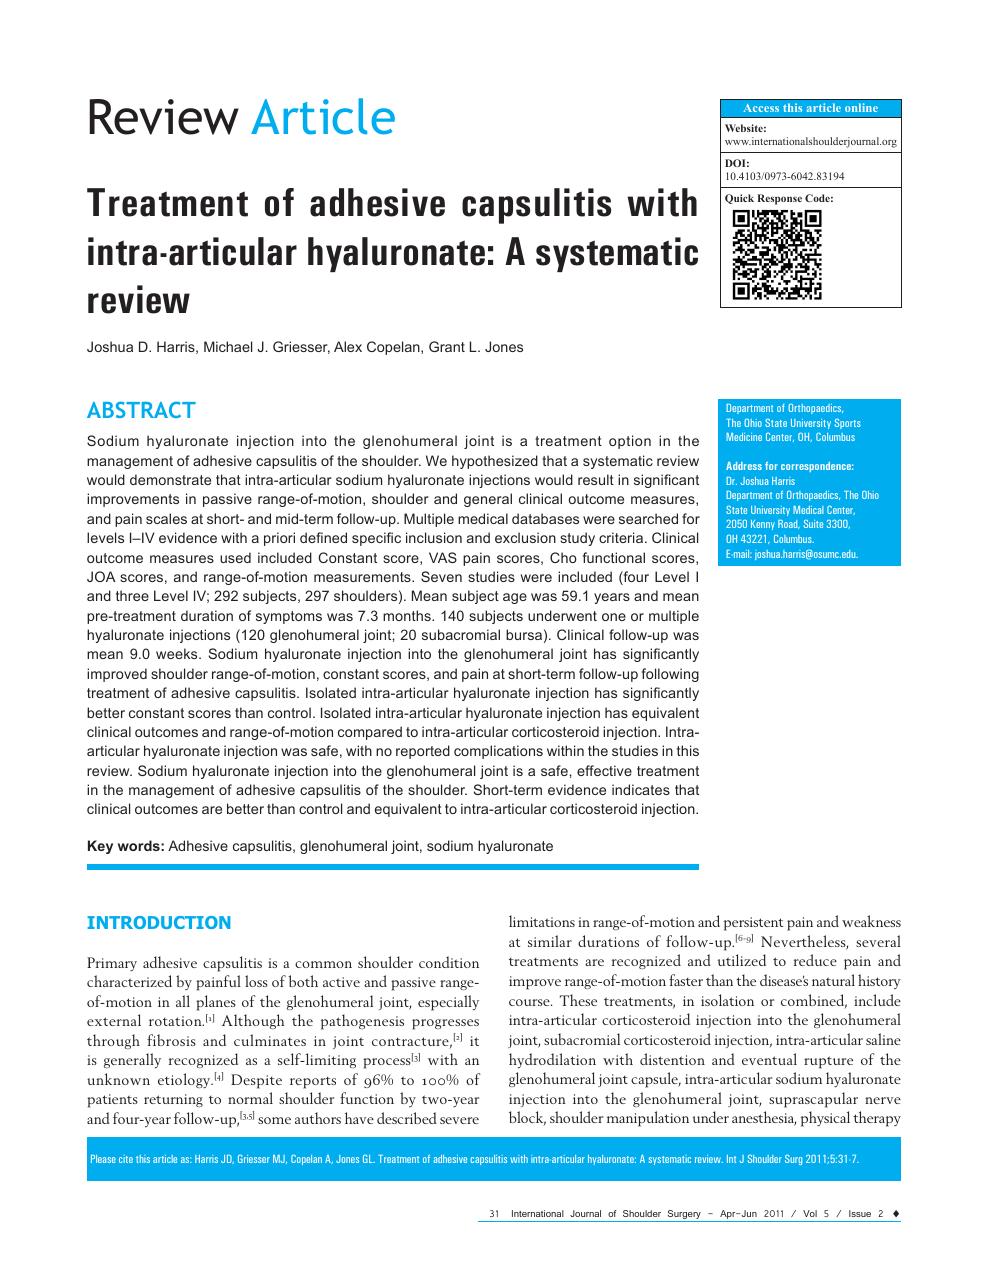 astin recenzii balsam articular tratamentul durerii articulare cu artrosilenă